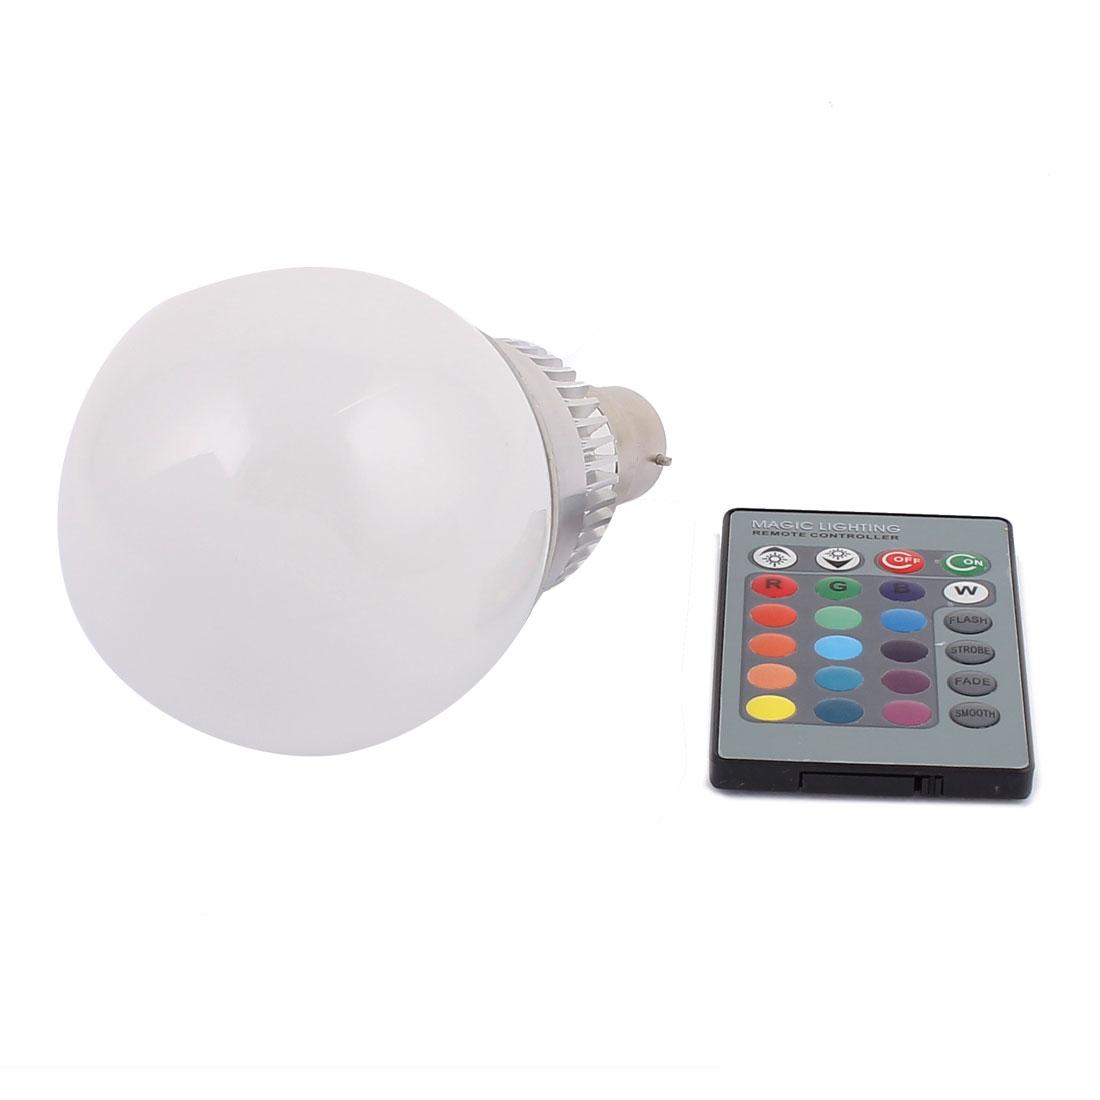 B22 16 Colors Decorative Ball Light RGB LED Lamp Bulb 10W AC 85V-265V w Remote Controller